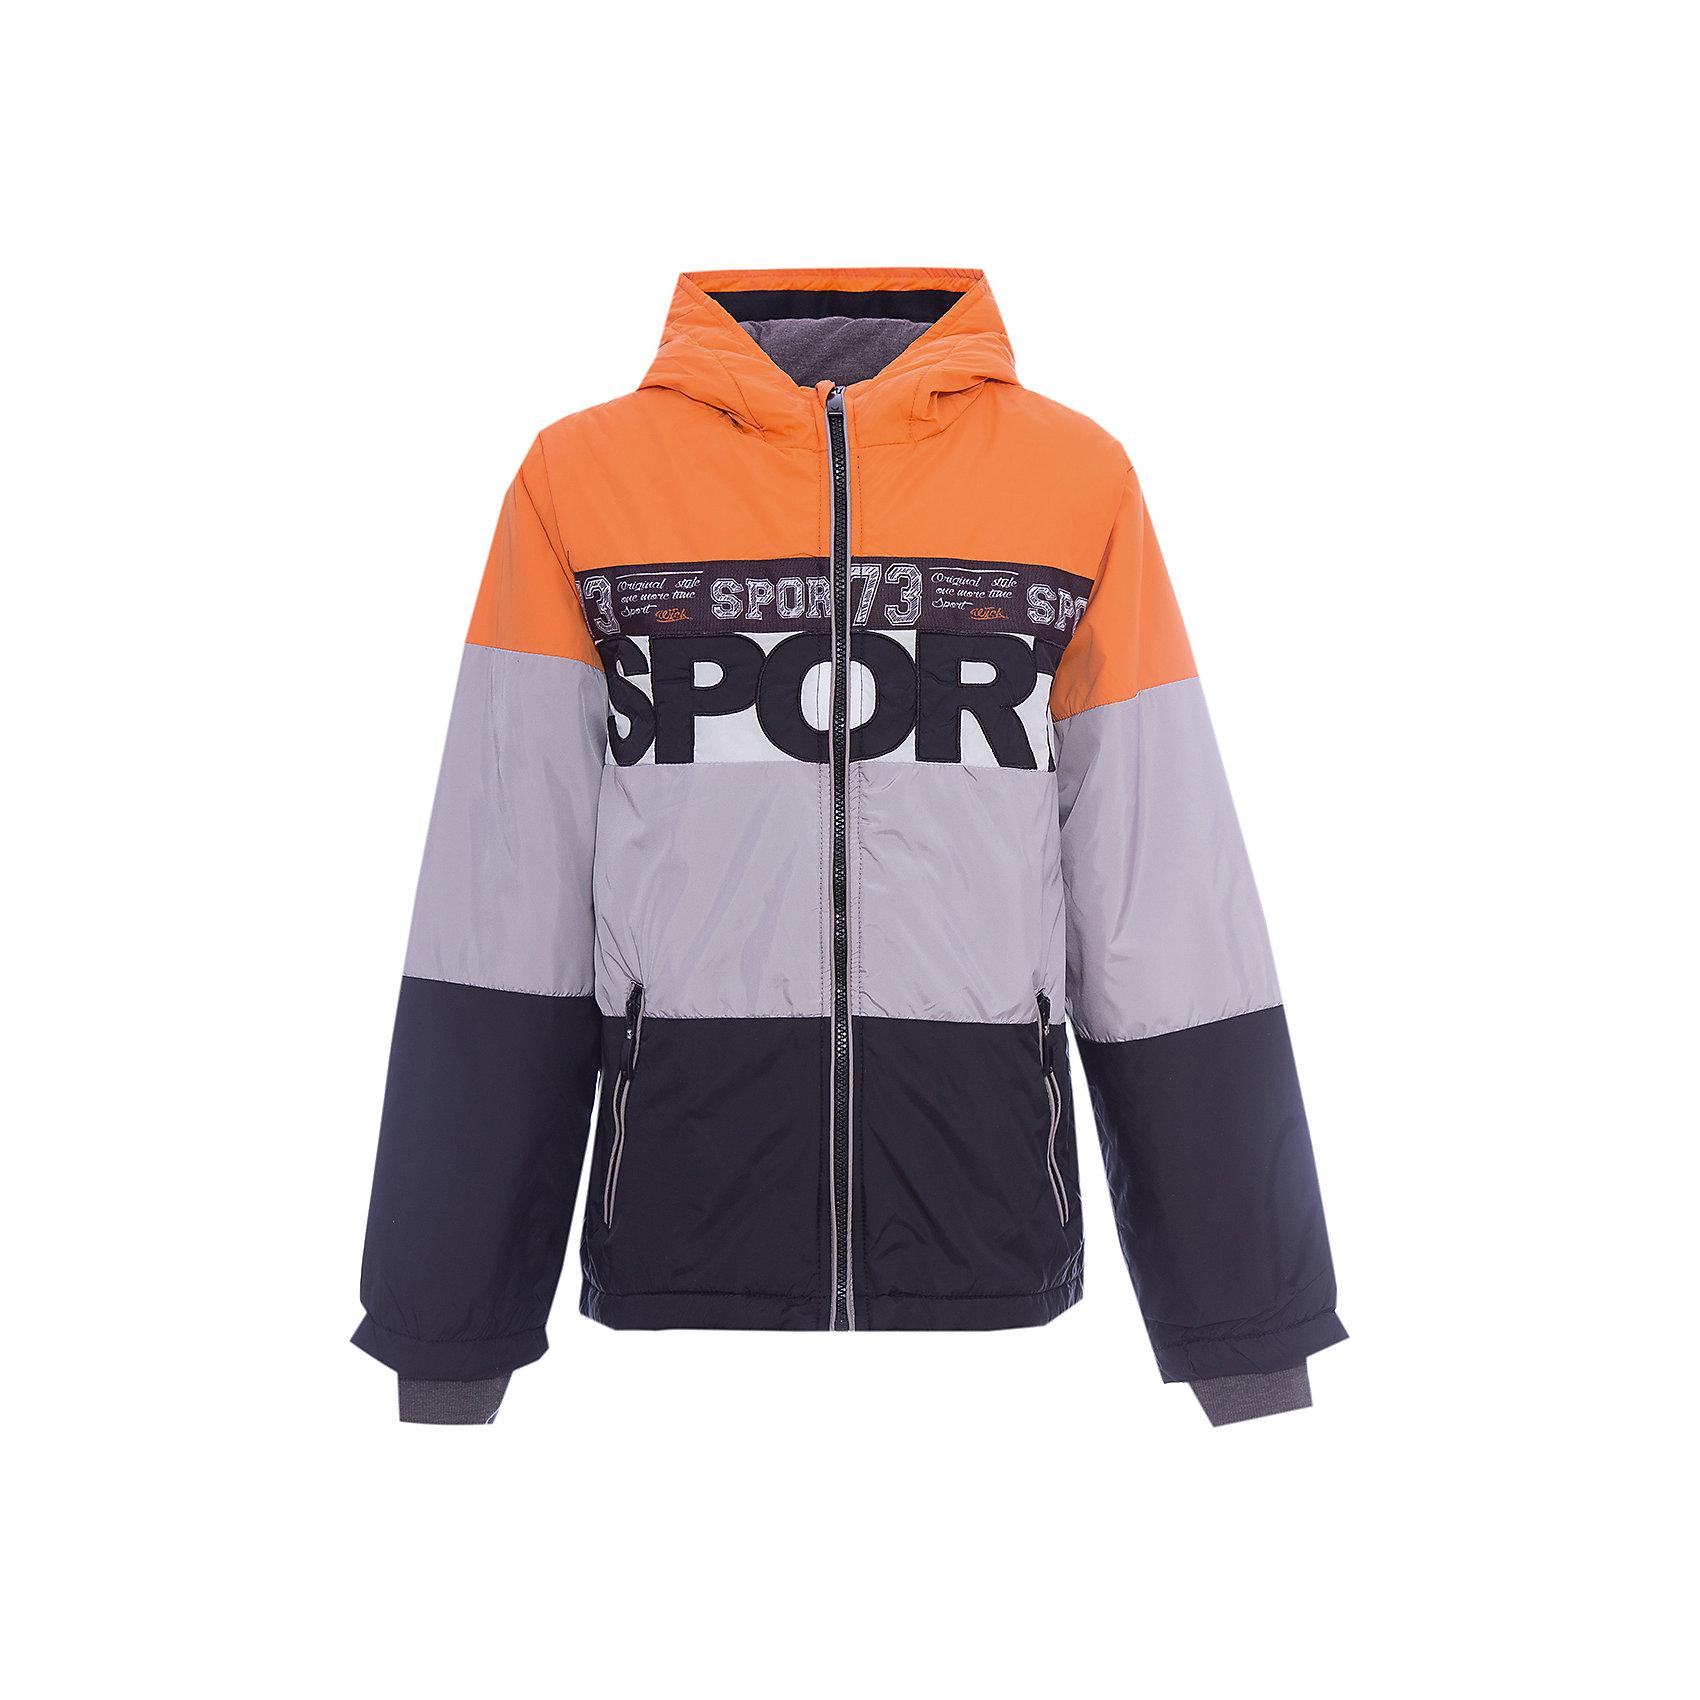 Куртка для мальчика WojcikВерхняя одежда<br>Куртка для мальчика Wojcik<br>Состав:<br>Полиэстер 100%<br><br>Ширина мм: 356<br>Глубина мм: 10<br>Высота мм: 245<br>Вес г: 519<br>Цвет: белый<br>Возраст от месяцев: 84<br>Возраст до месяцев: 96<br>Пол: Мужской<br>Возраст: Детский<br>Размер: 128,134,140,146,152,158<br>SKU: 5588887